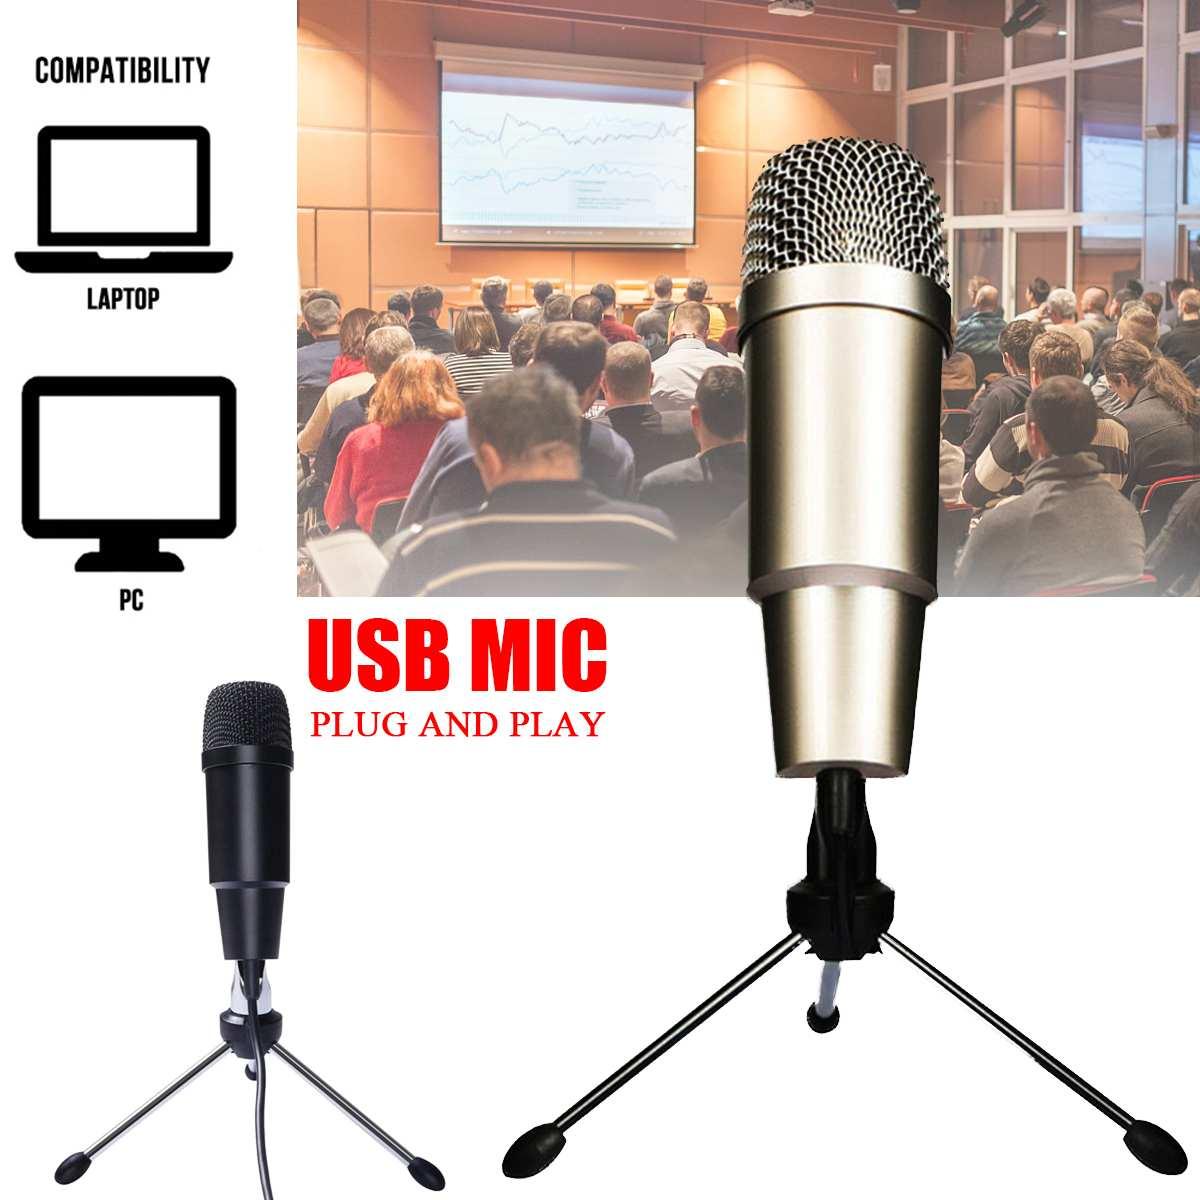 Mini USB micrófono de solapa PC/teléfono/cámara Mic externo portátil ojal micrófonos para iPhone de la computadora portátil